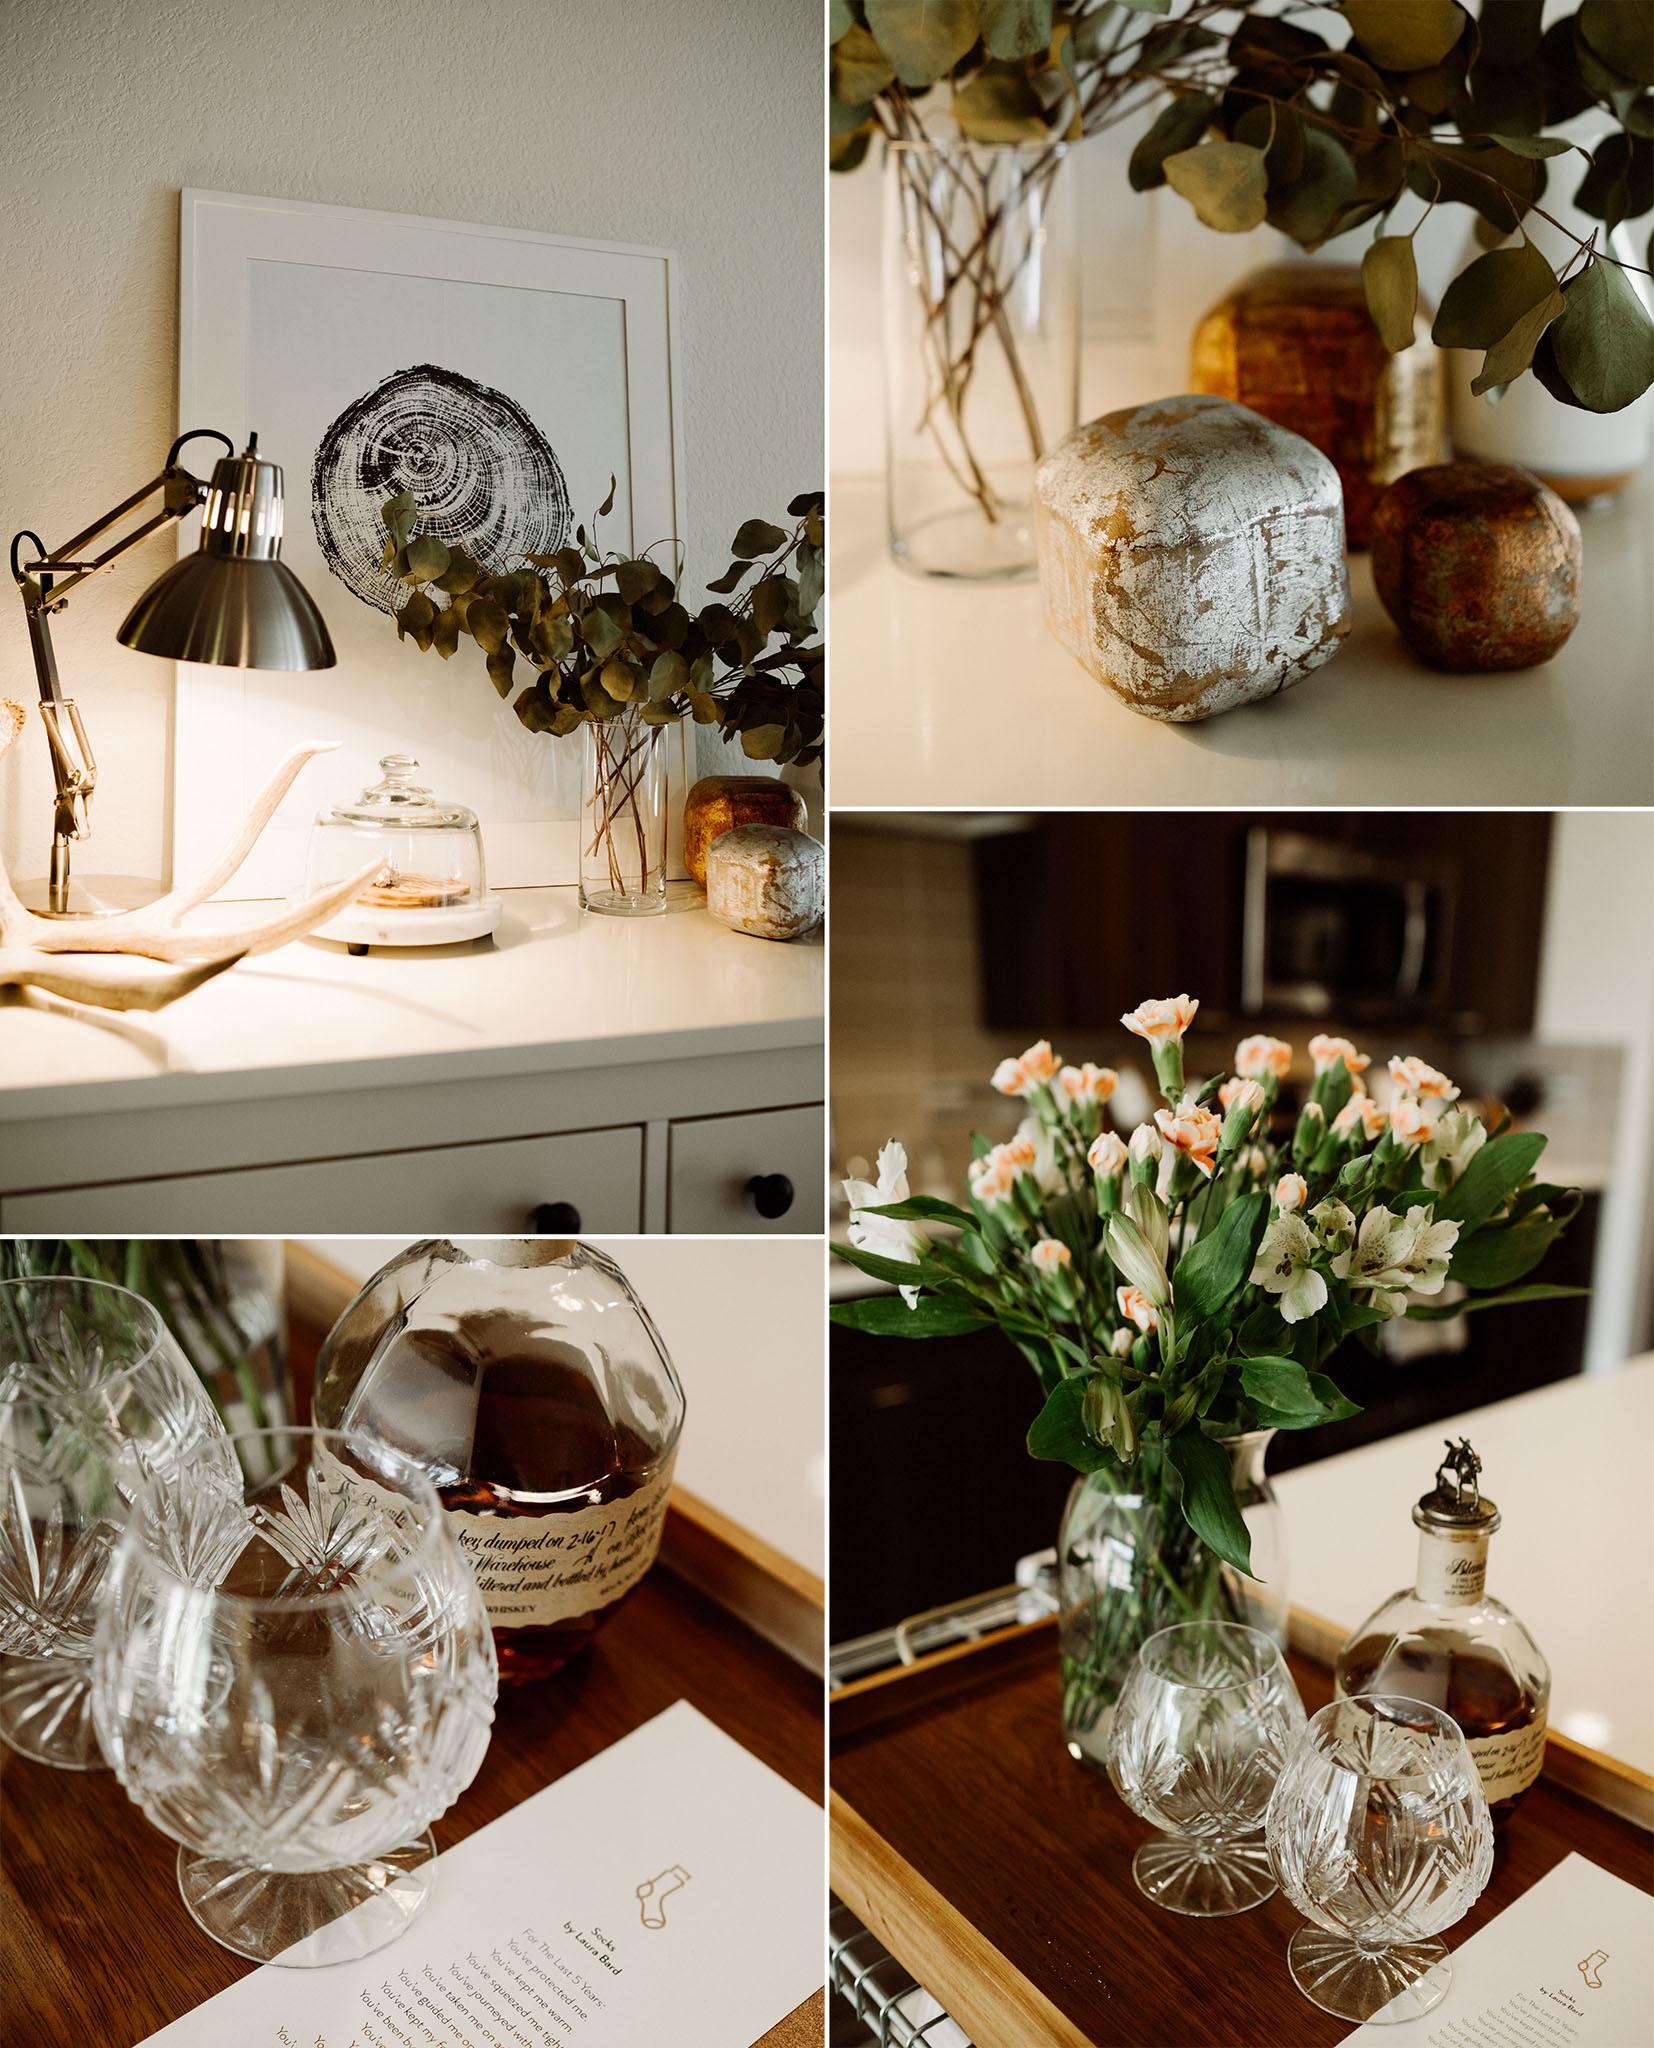 Arizona-in-home-session-wedding-photographer-details (1).jpg